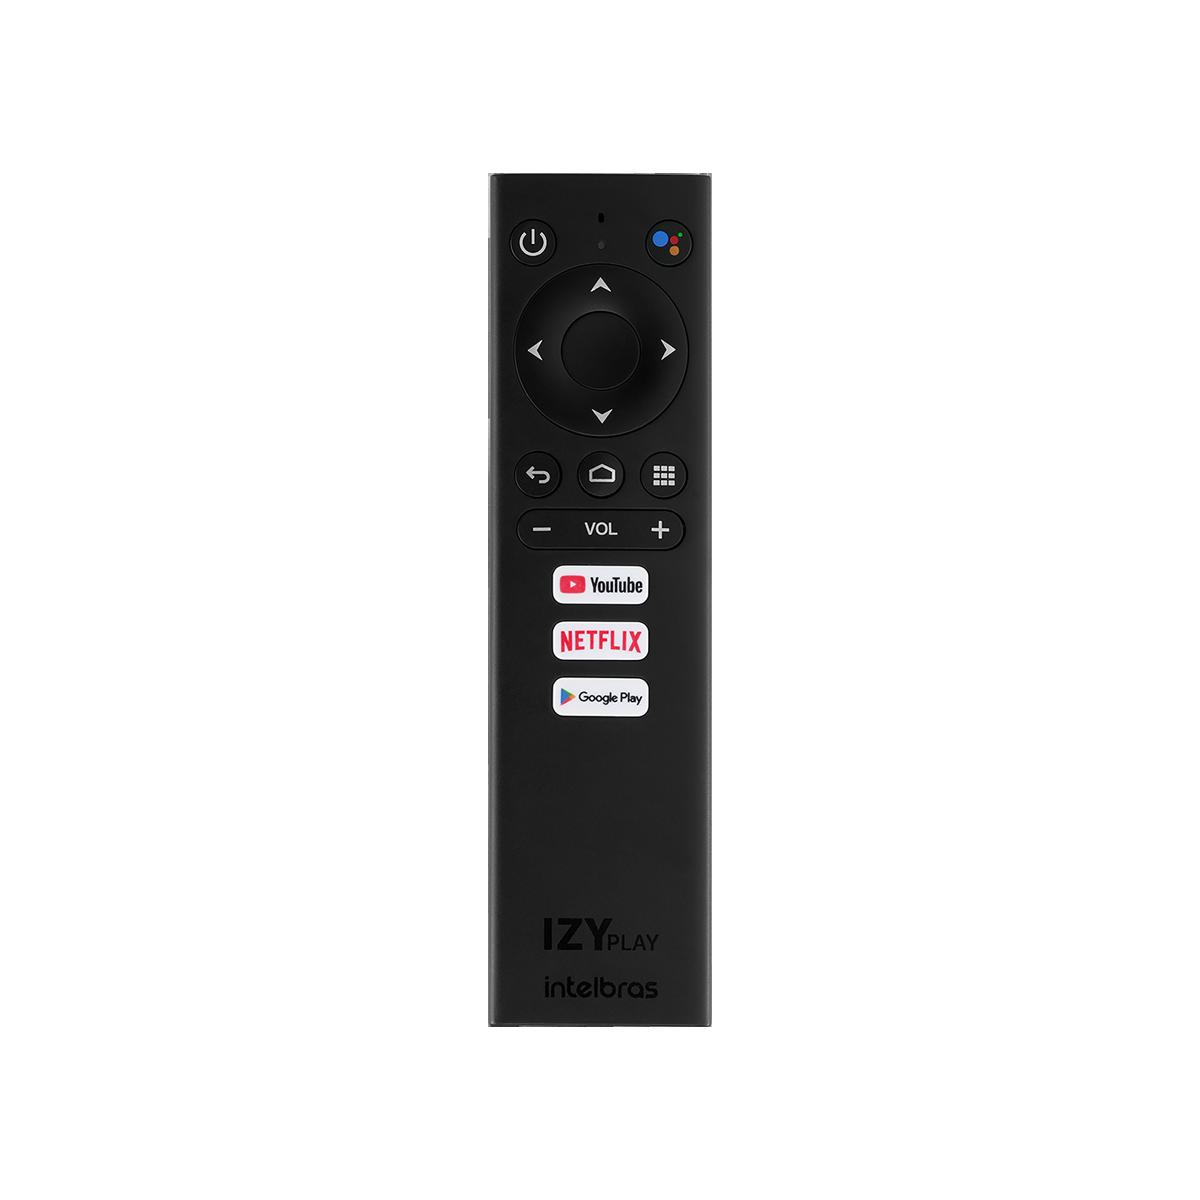 Smart Box Intelbras Android TV IZY Play